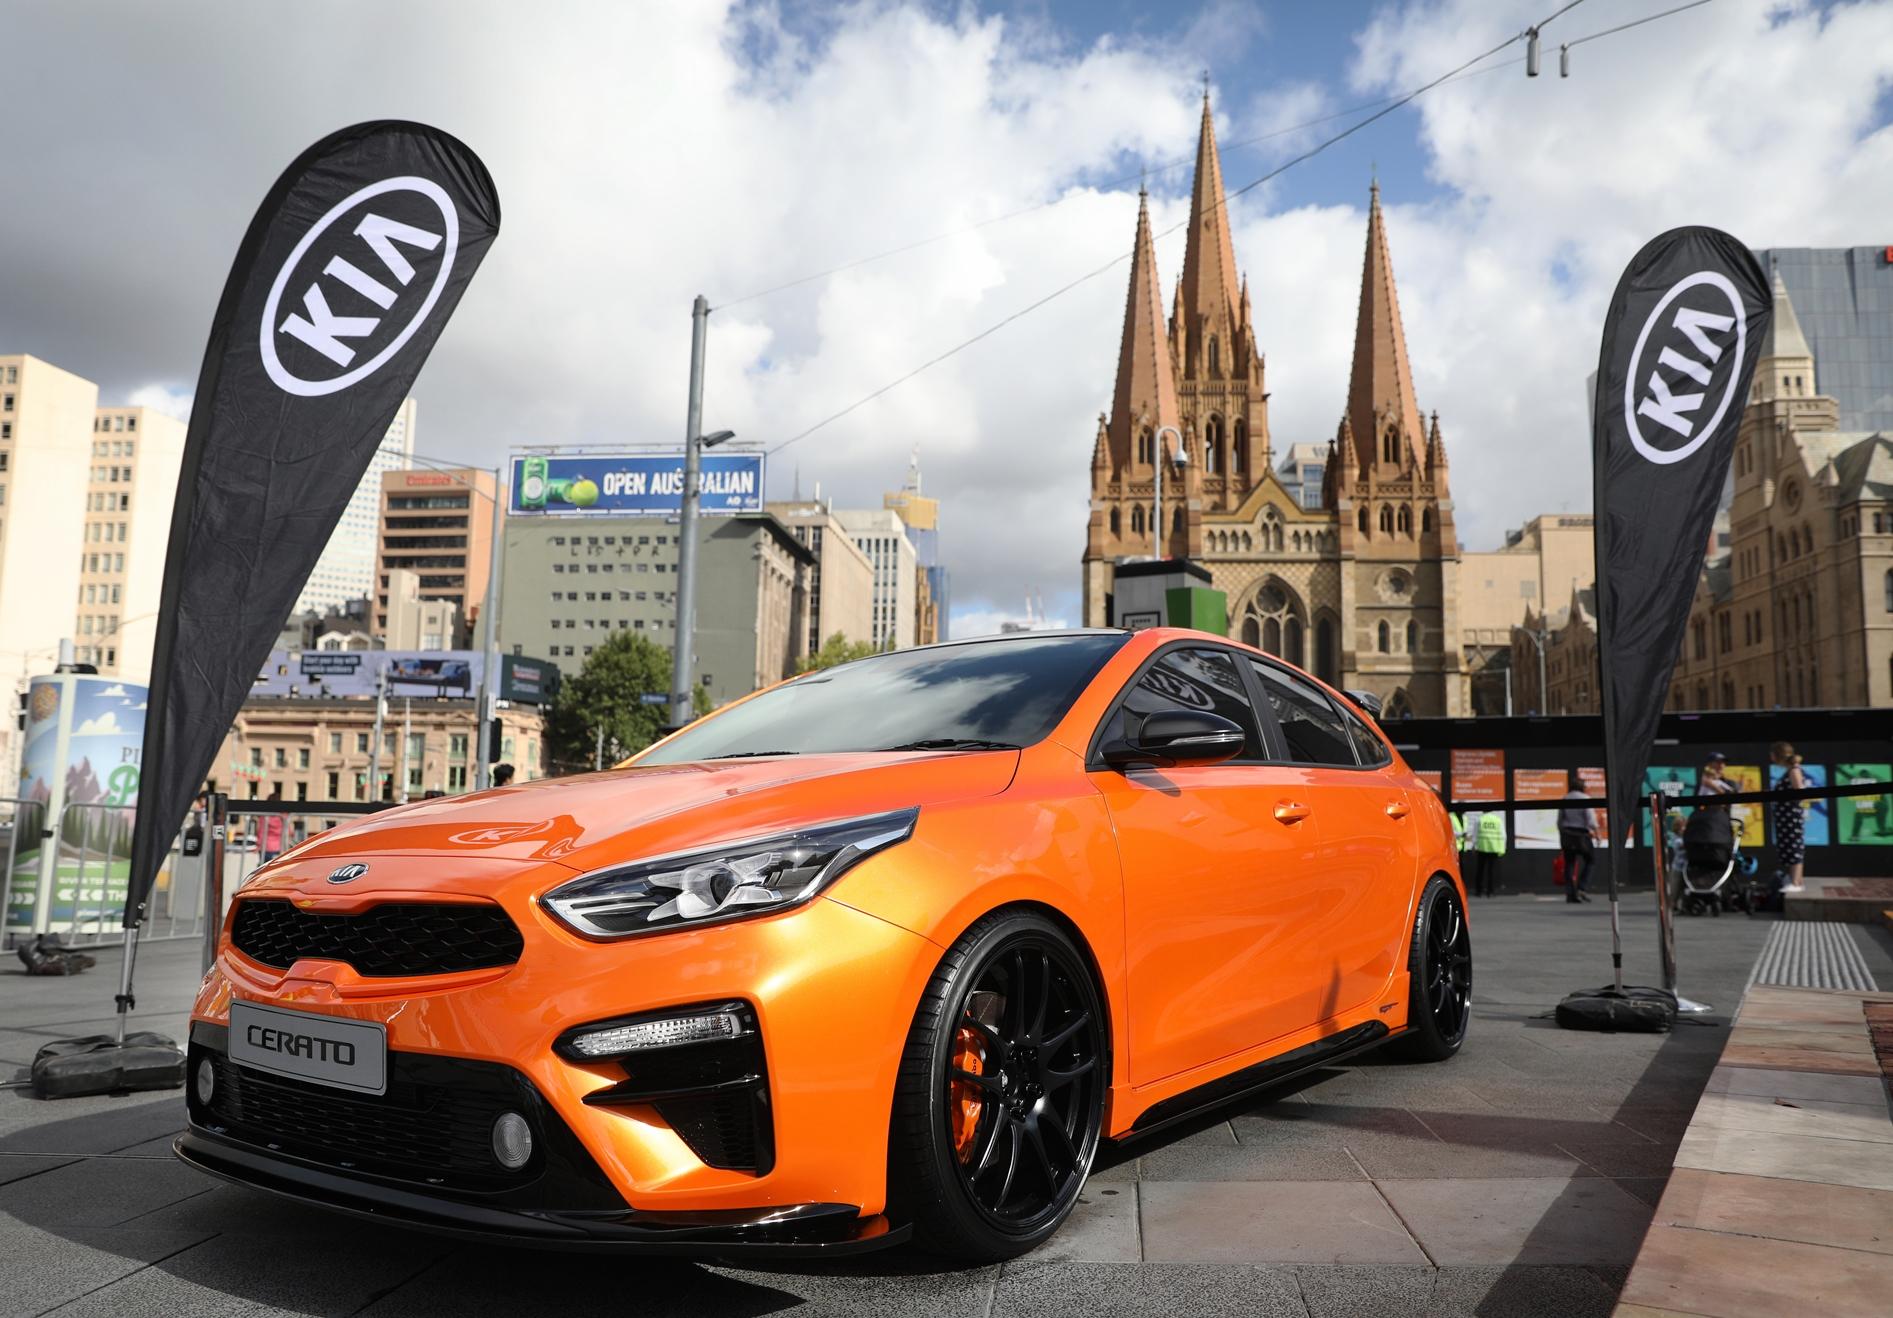 Kia Motors dostarczyła flotę 120 aut organizatorom Australian Open 2019